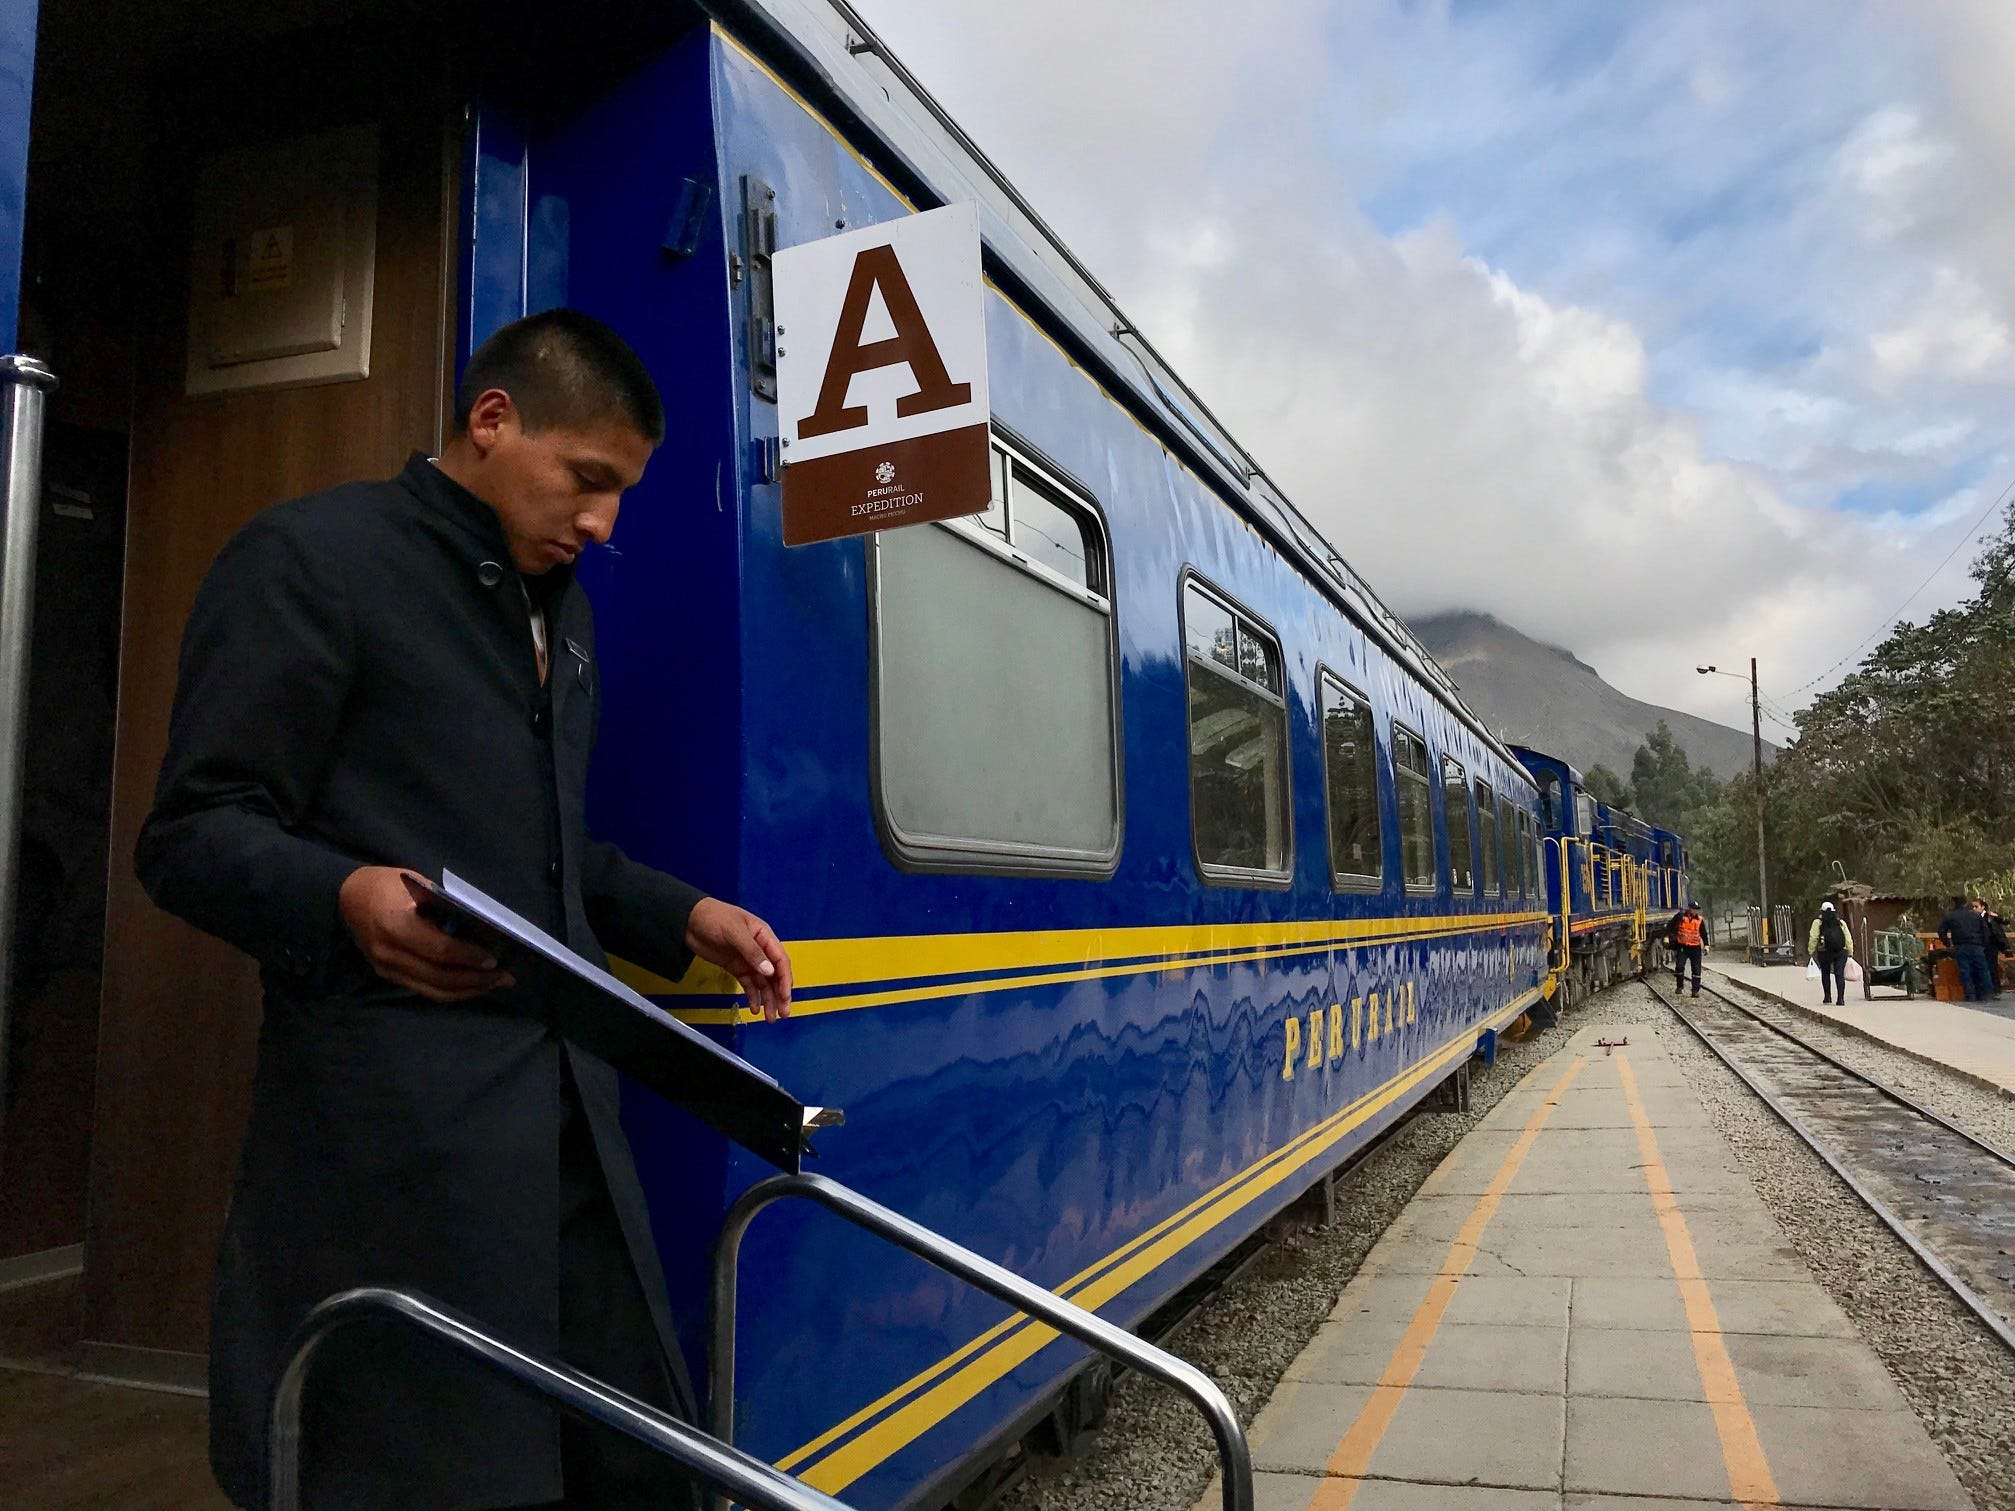 Boarding the train to Machu Picchu